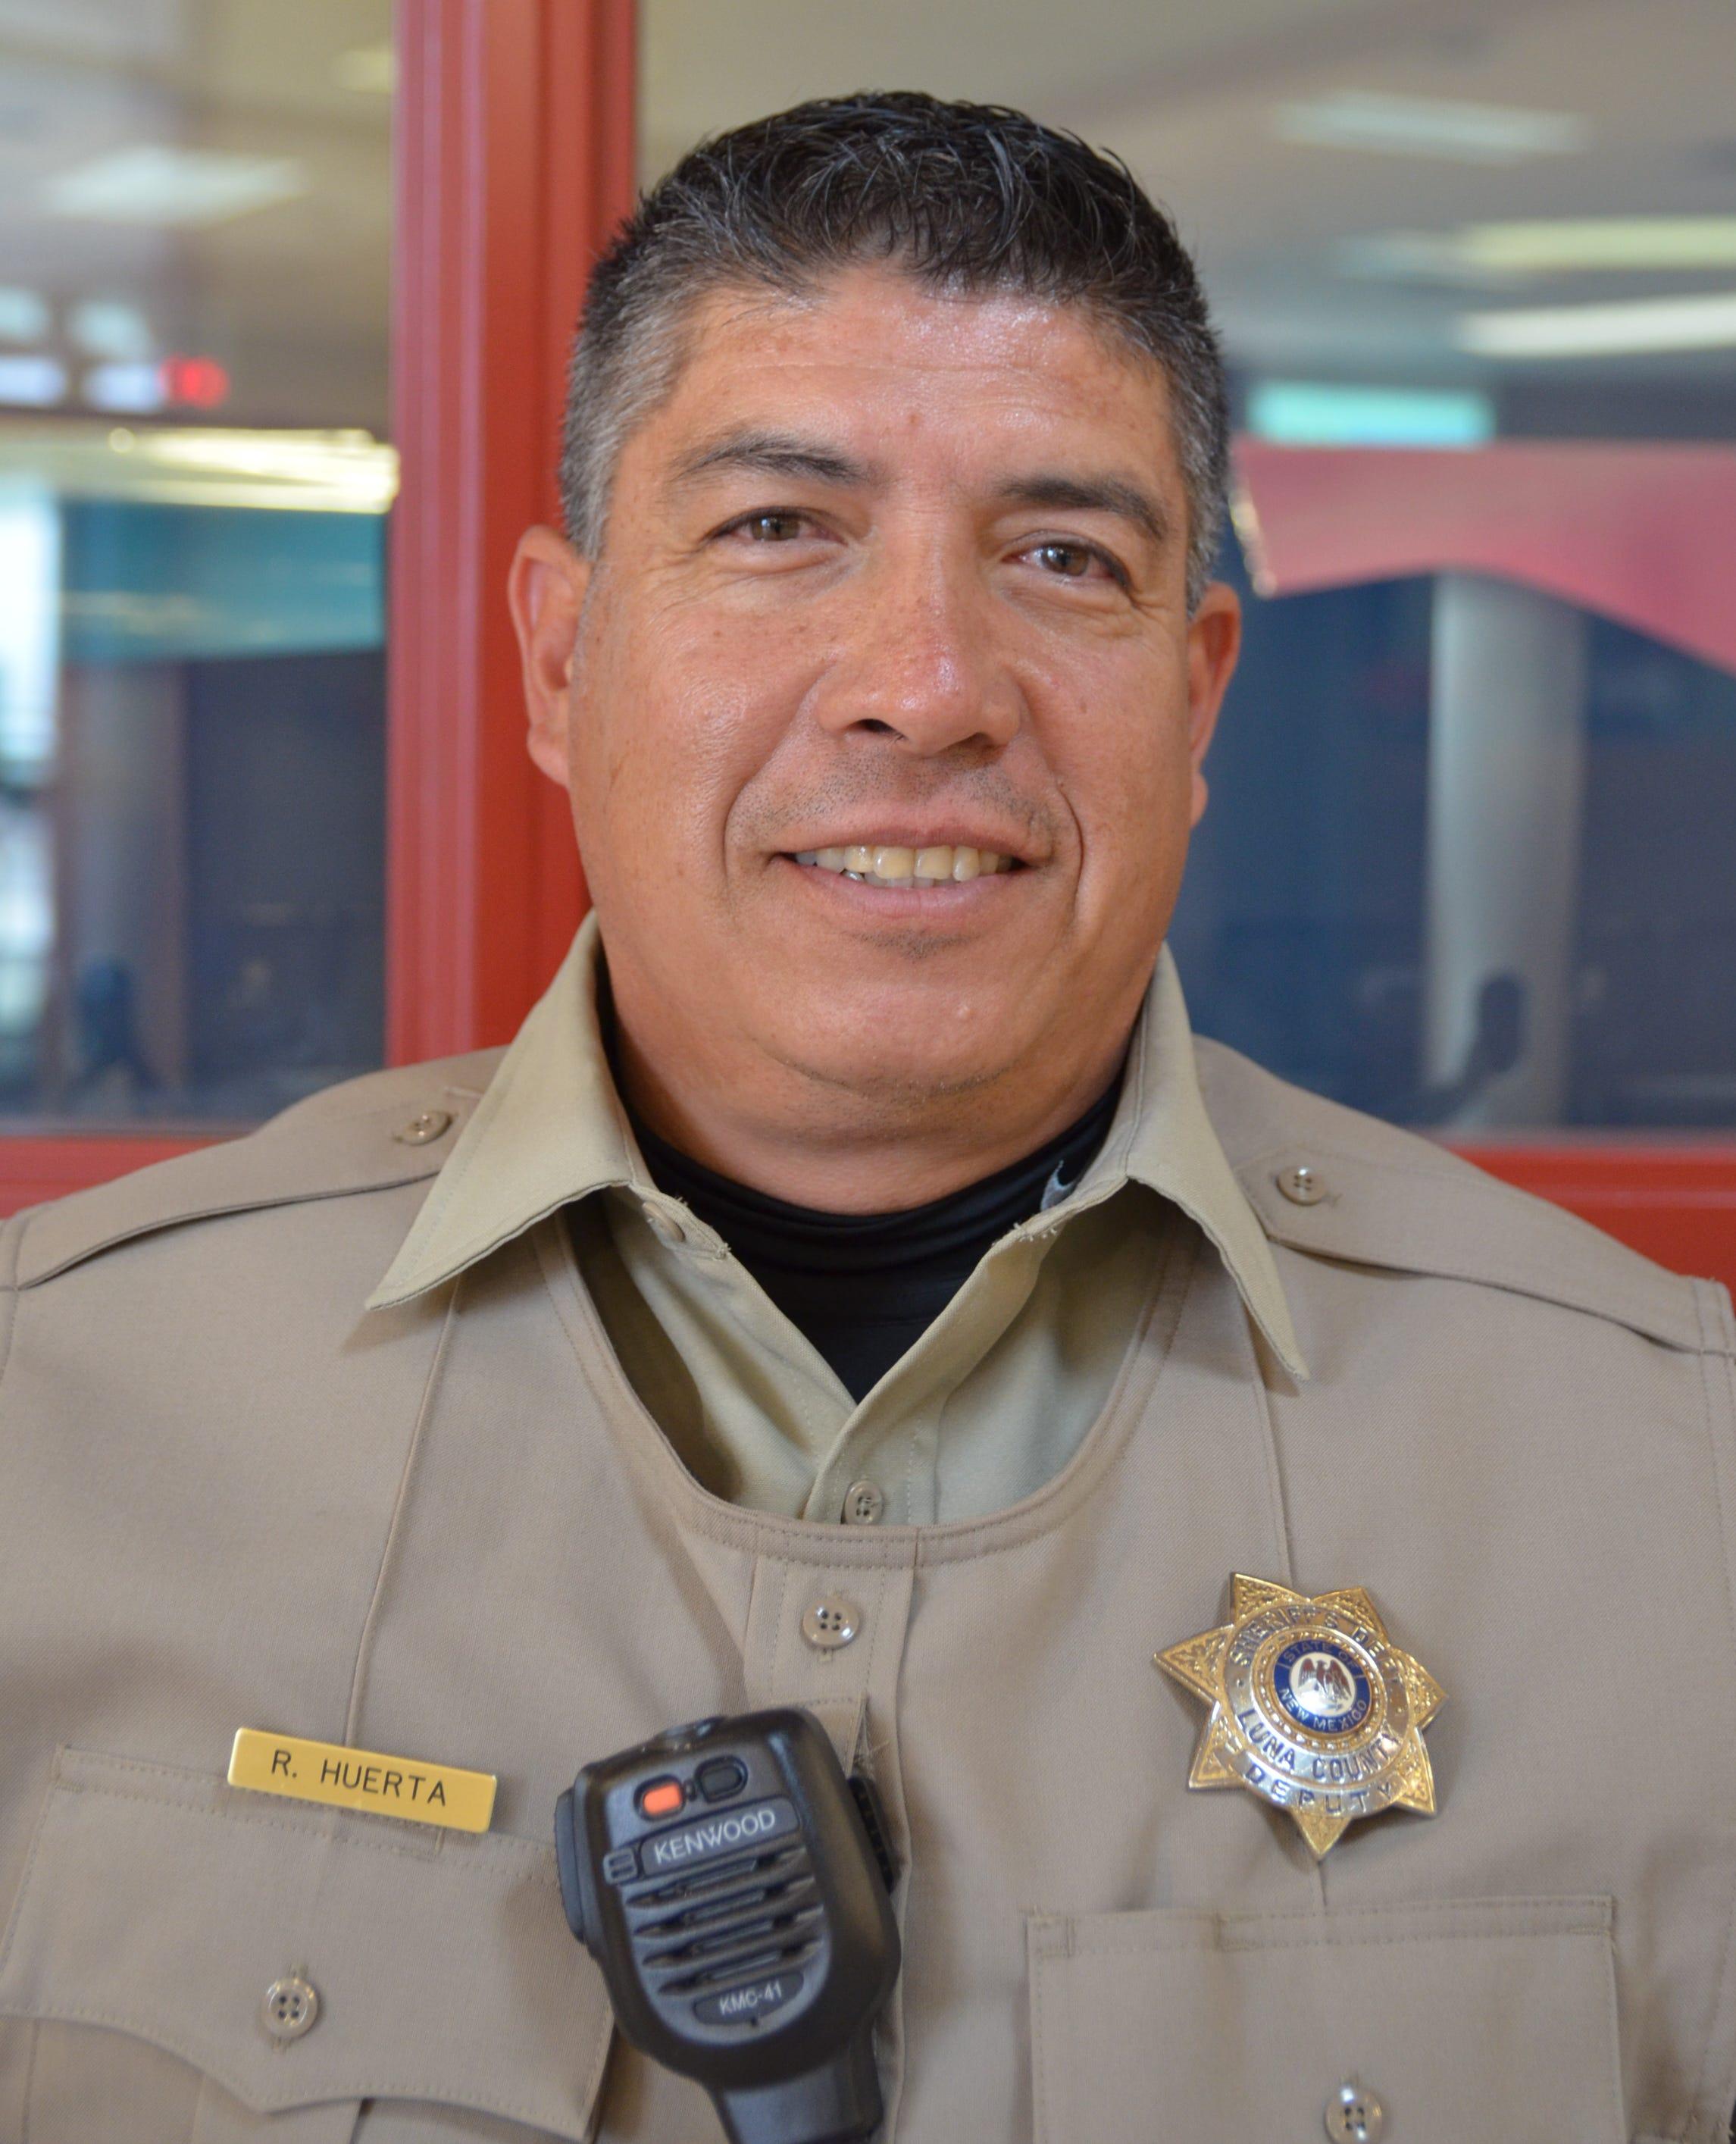 Sheriff Deputy and School Resource Officer Richard Huerta